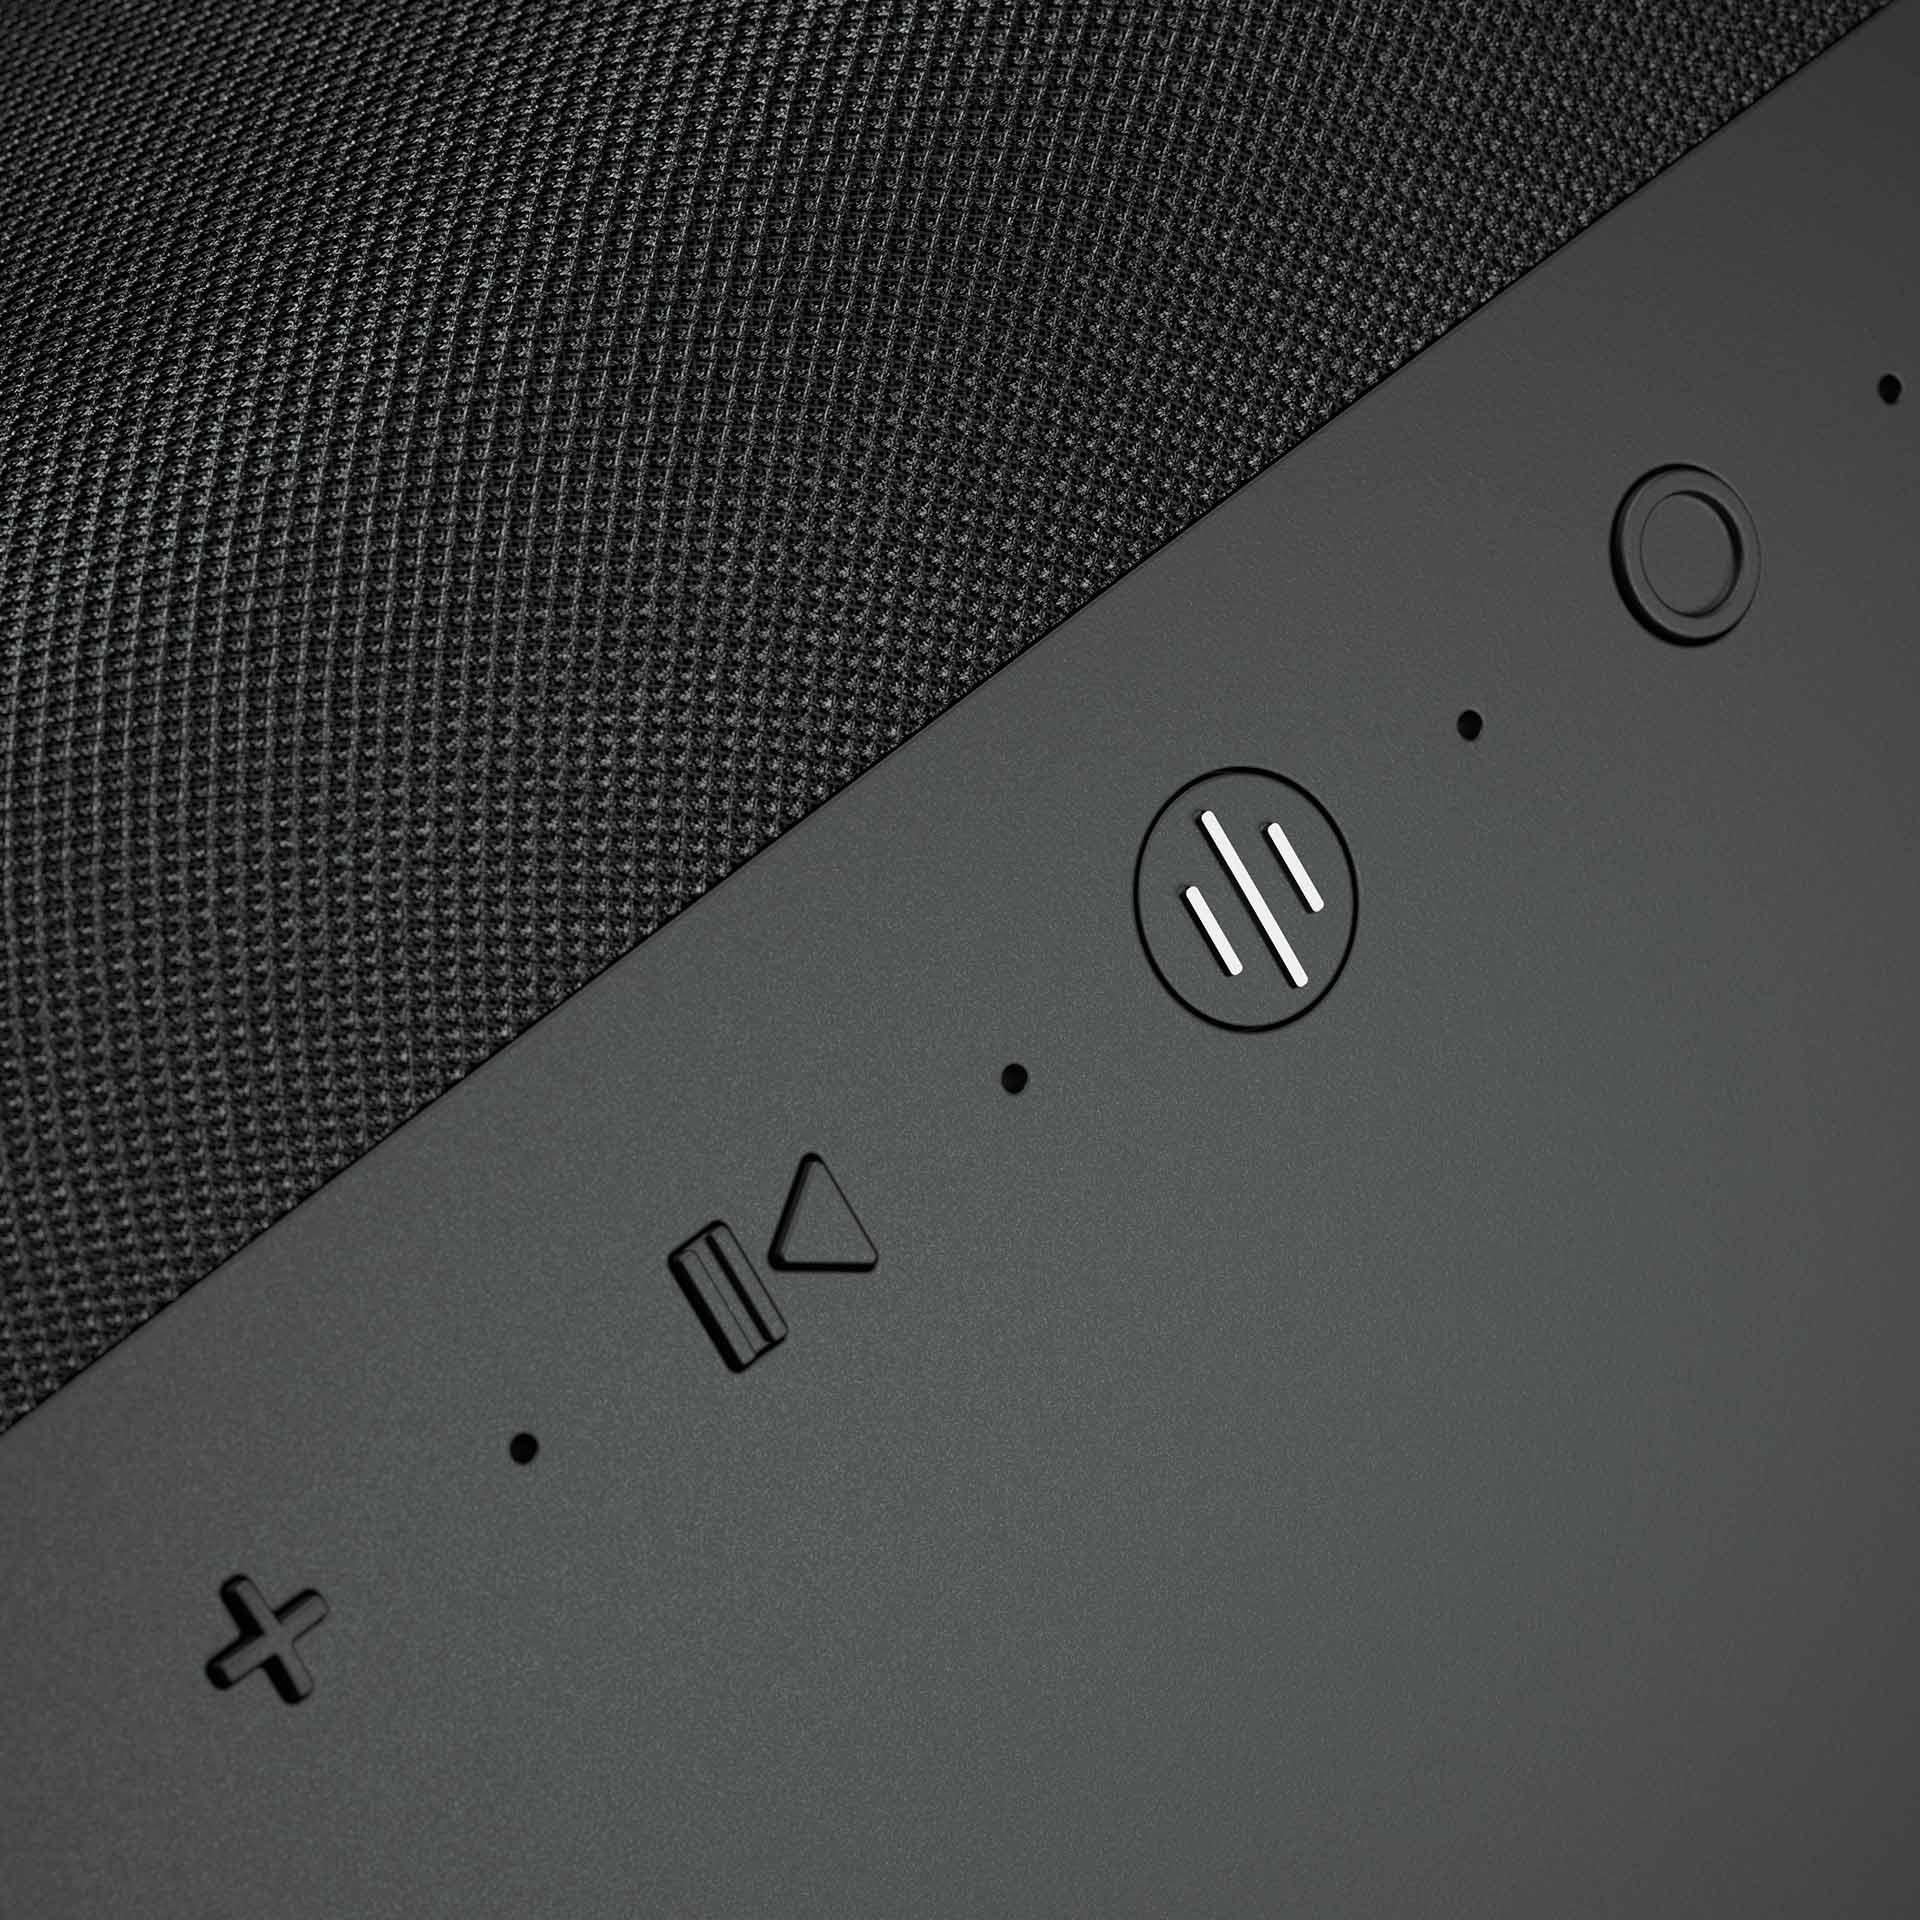 Some prefer buttons to Alexa.